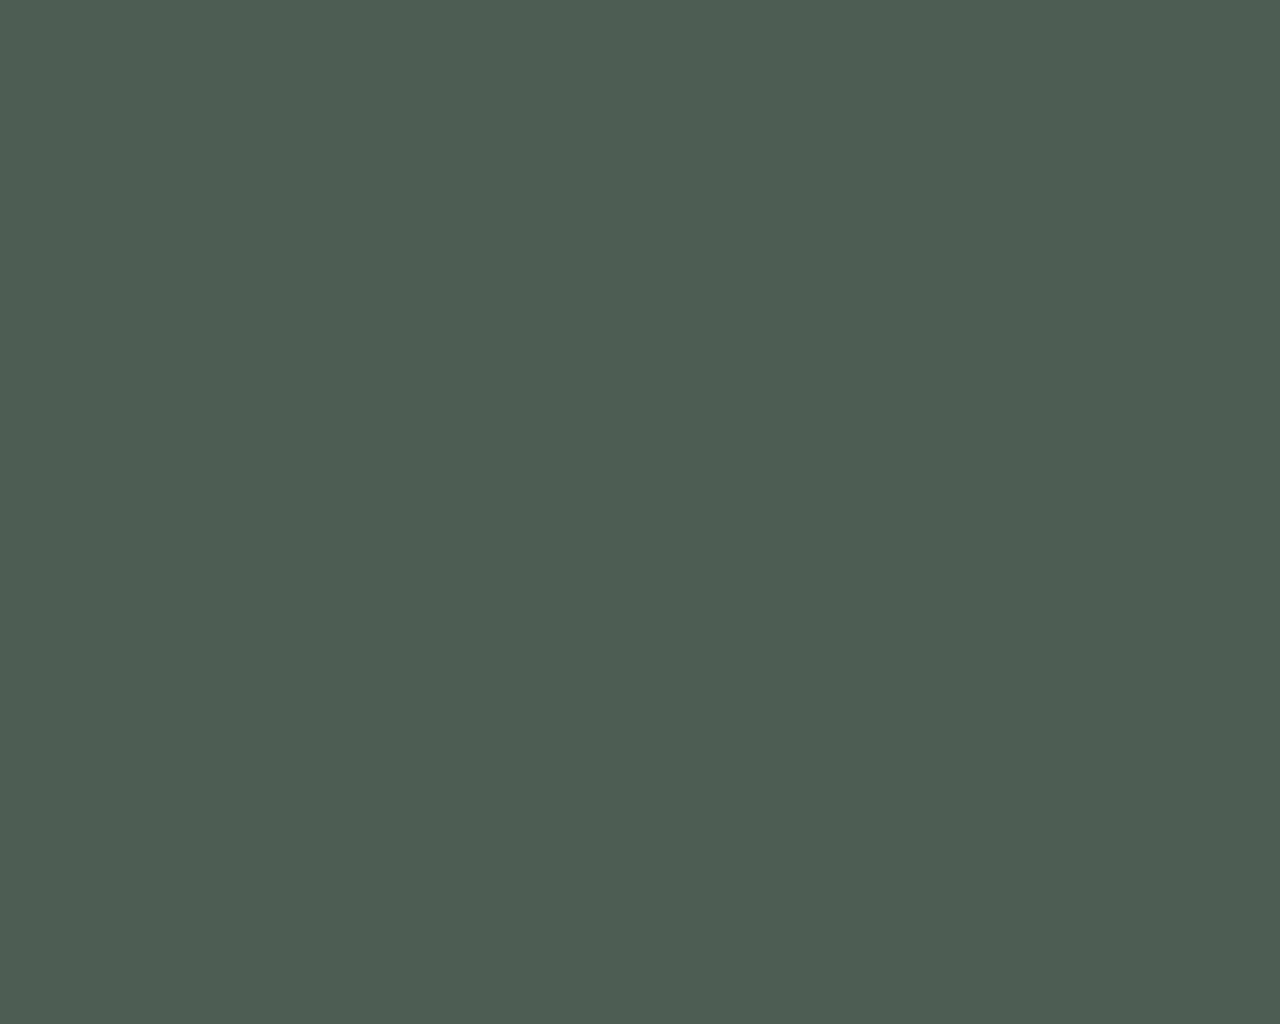 1280x1024 Feldgrau Solid Color Background